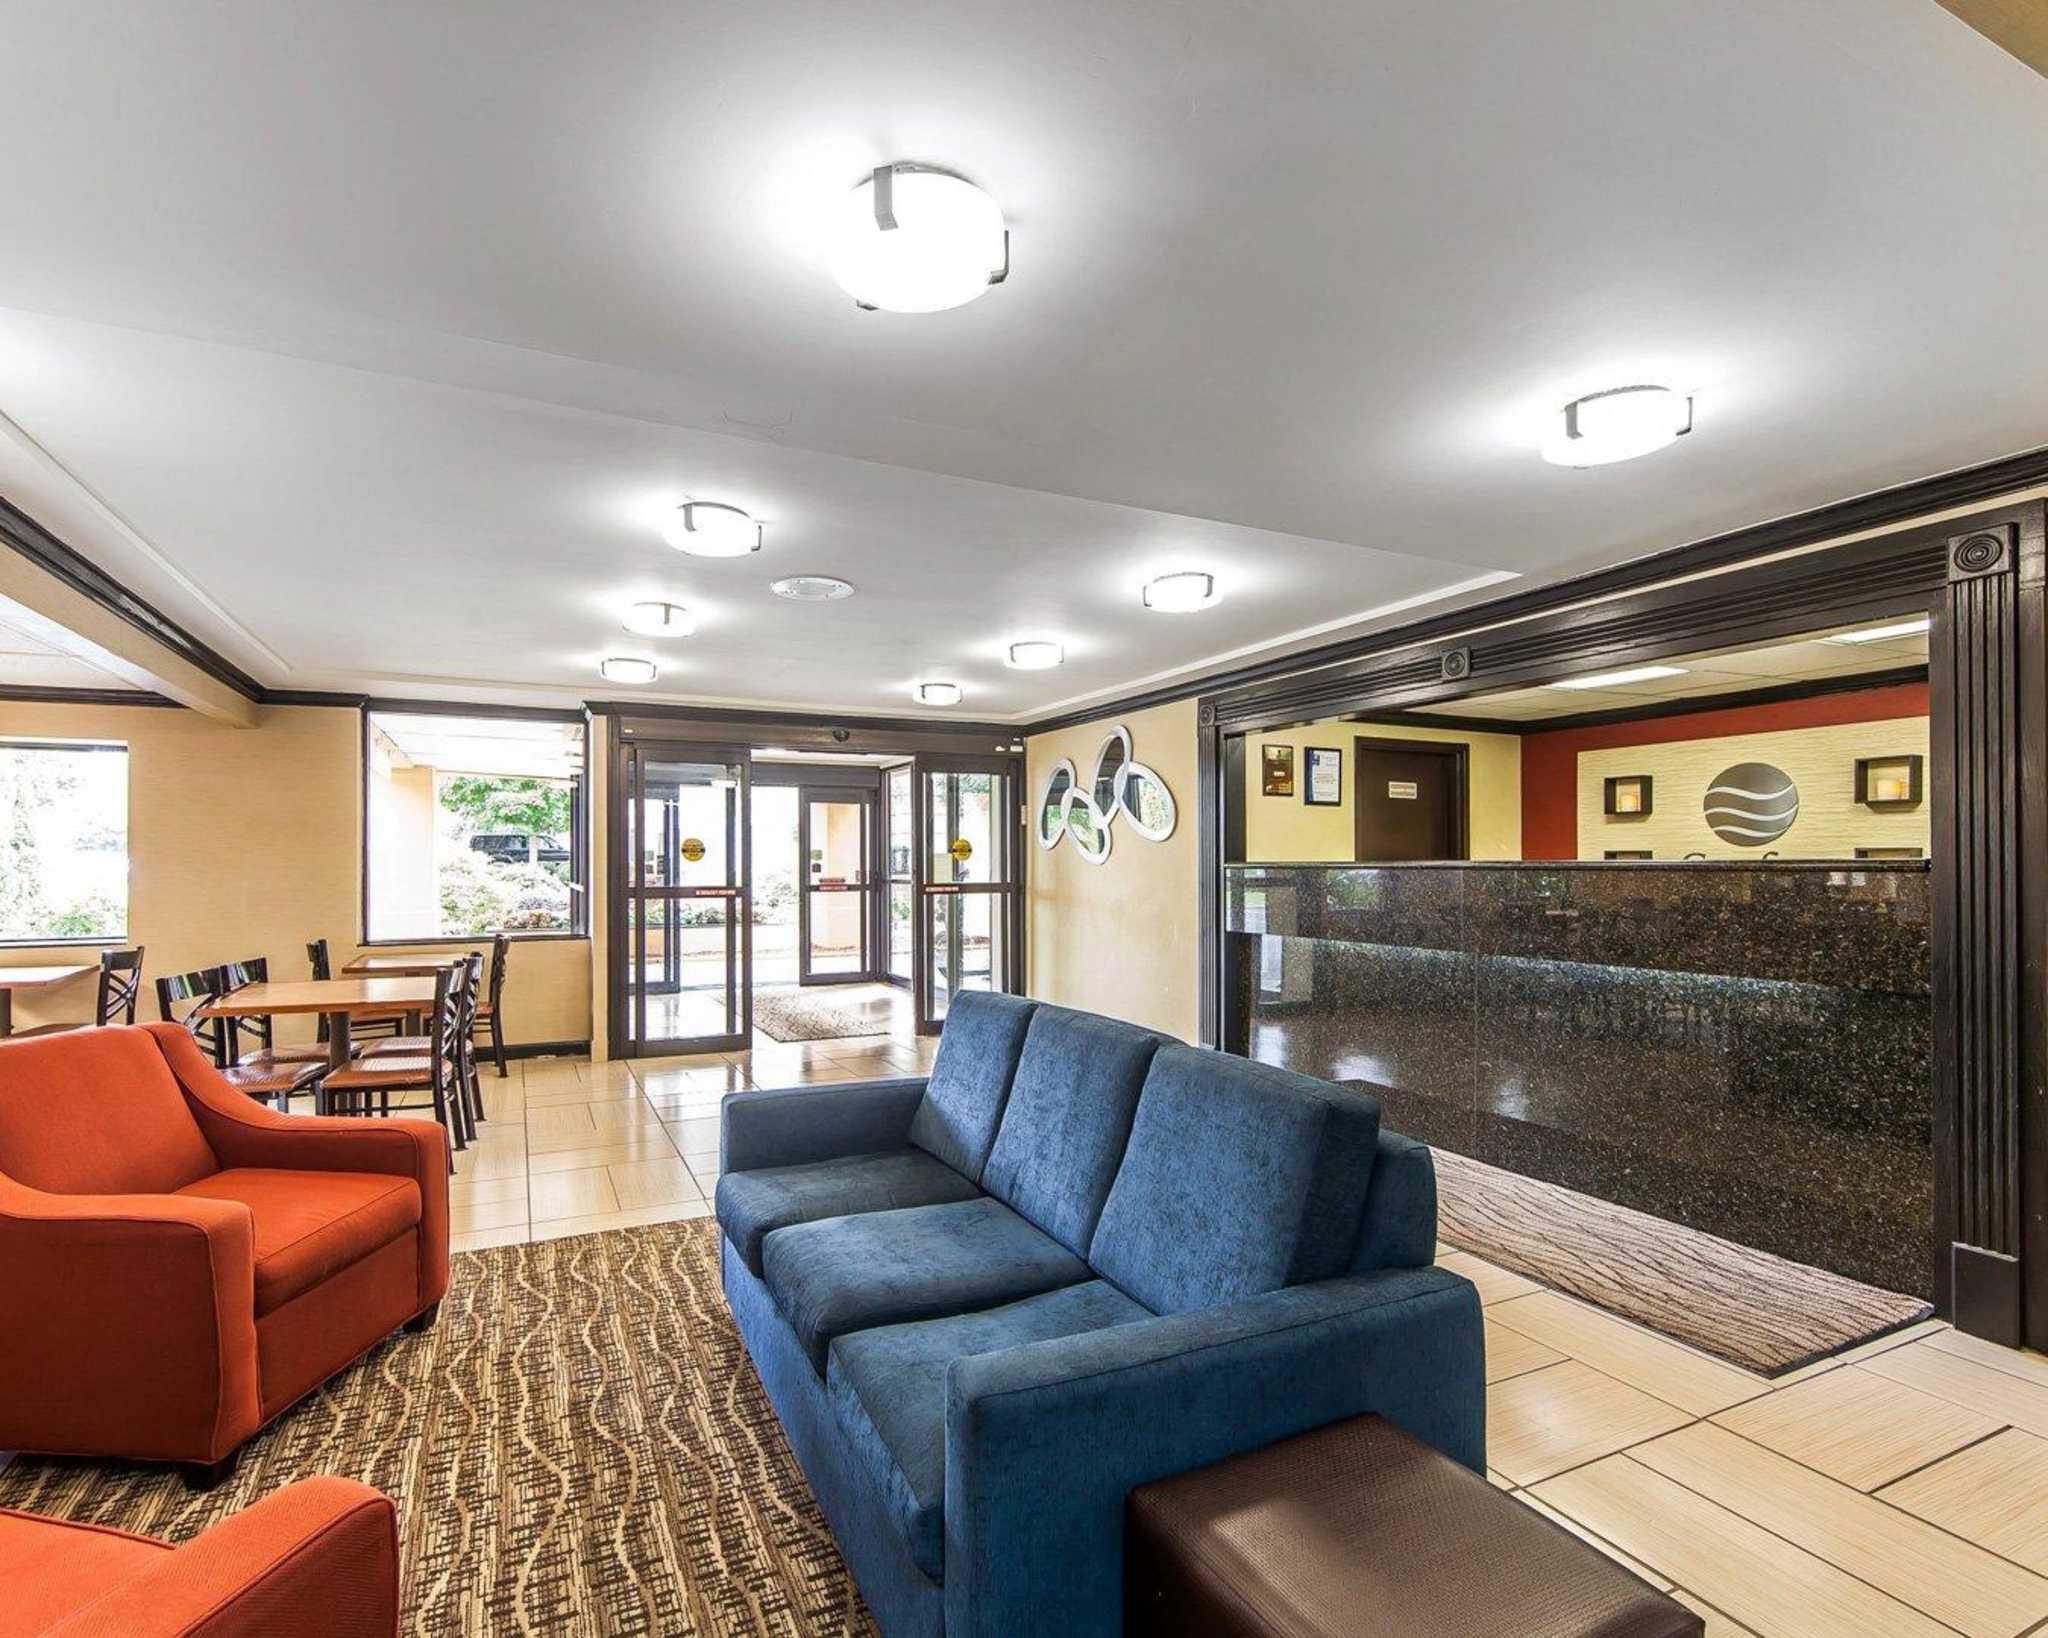 Comfort Inn & Suites image 26